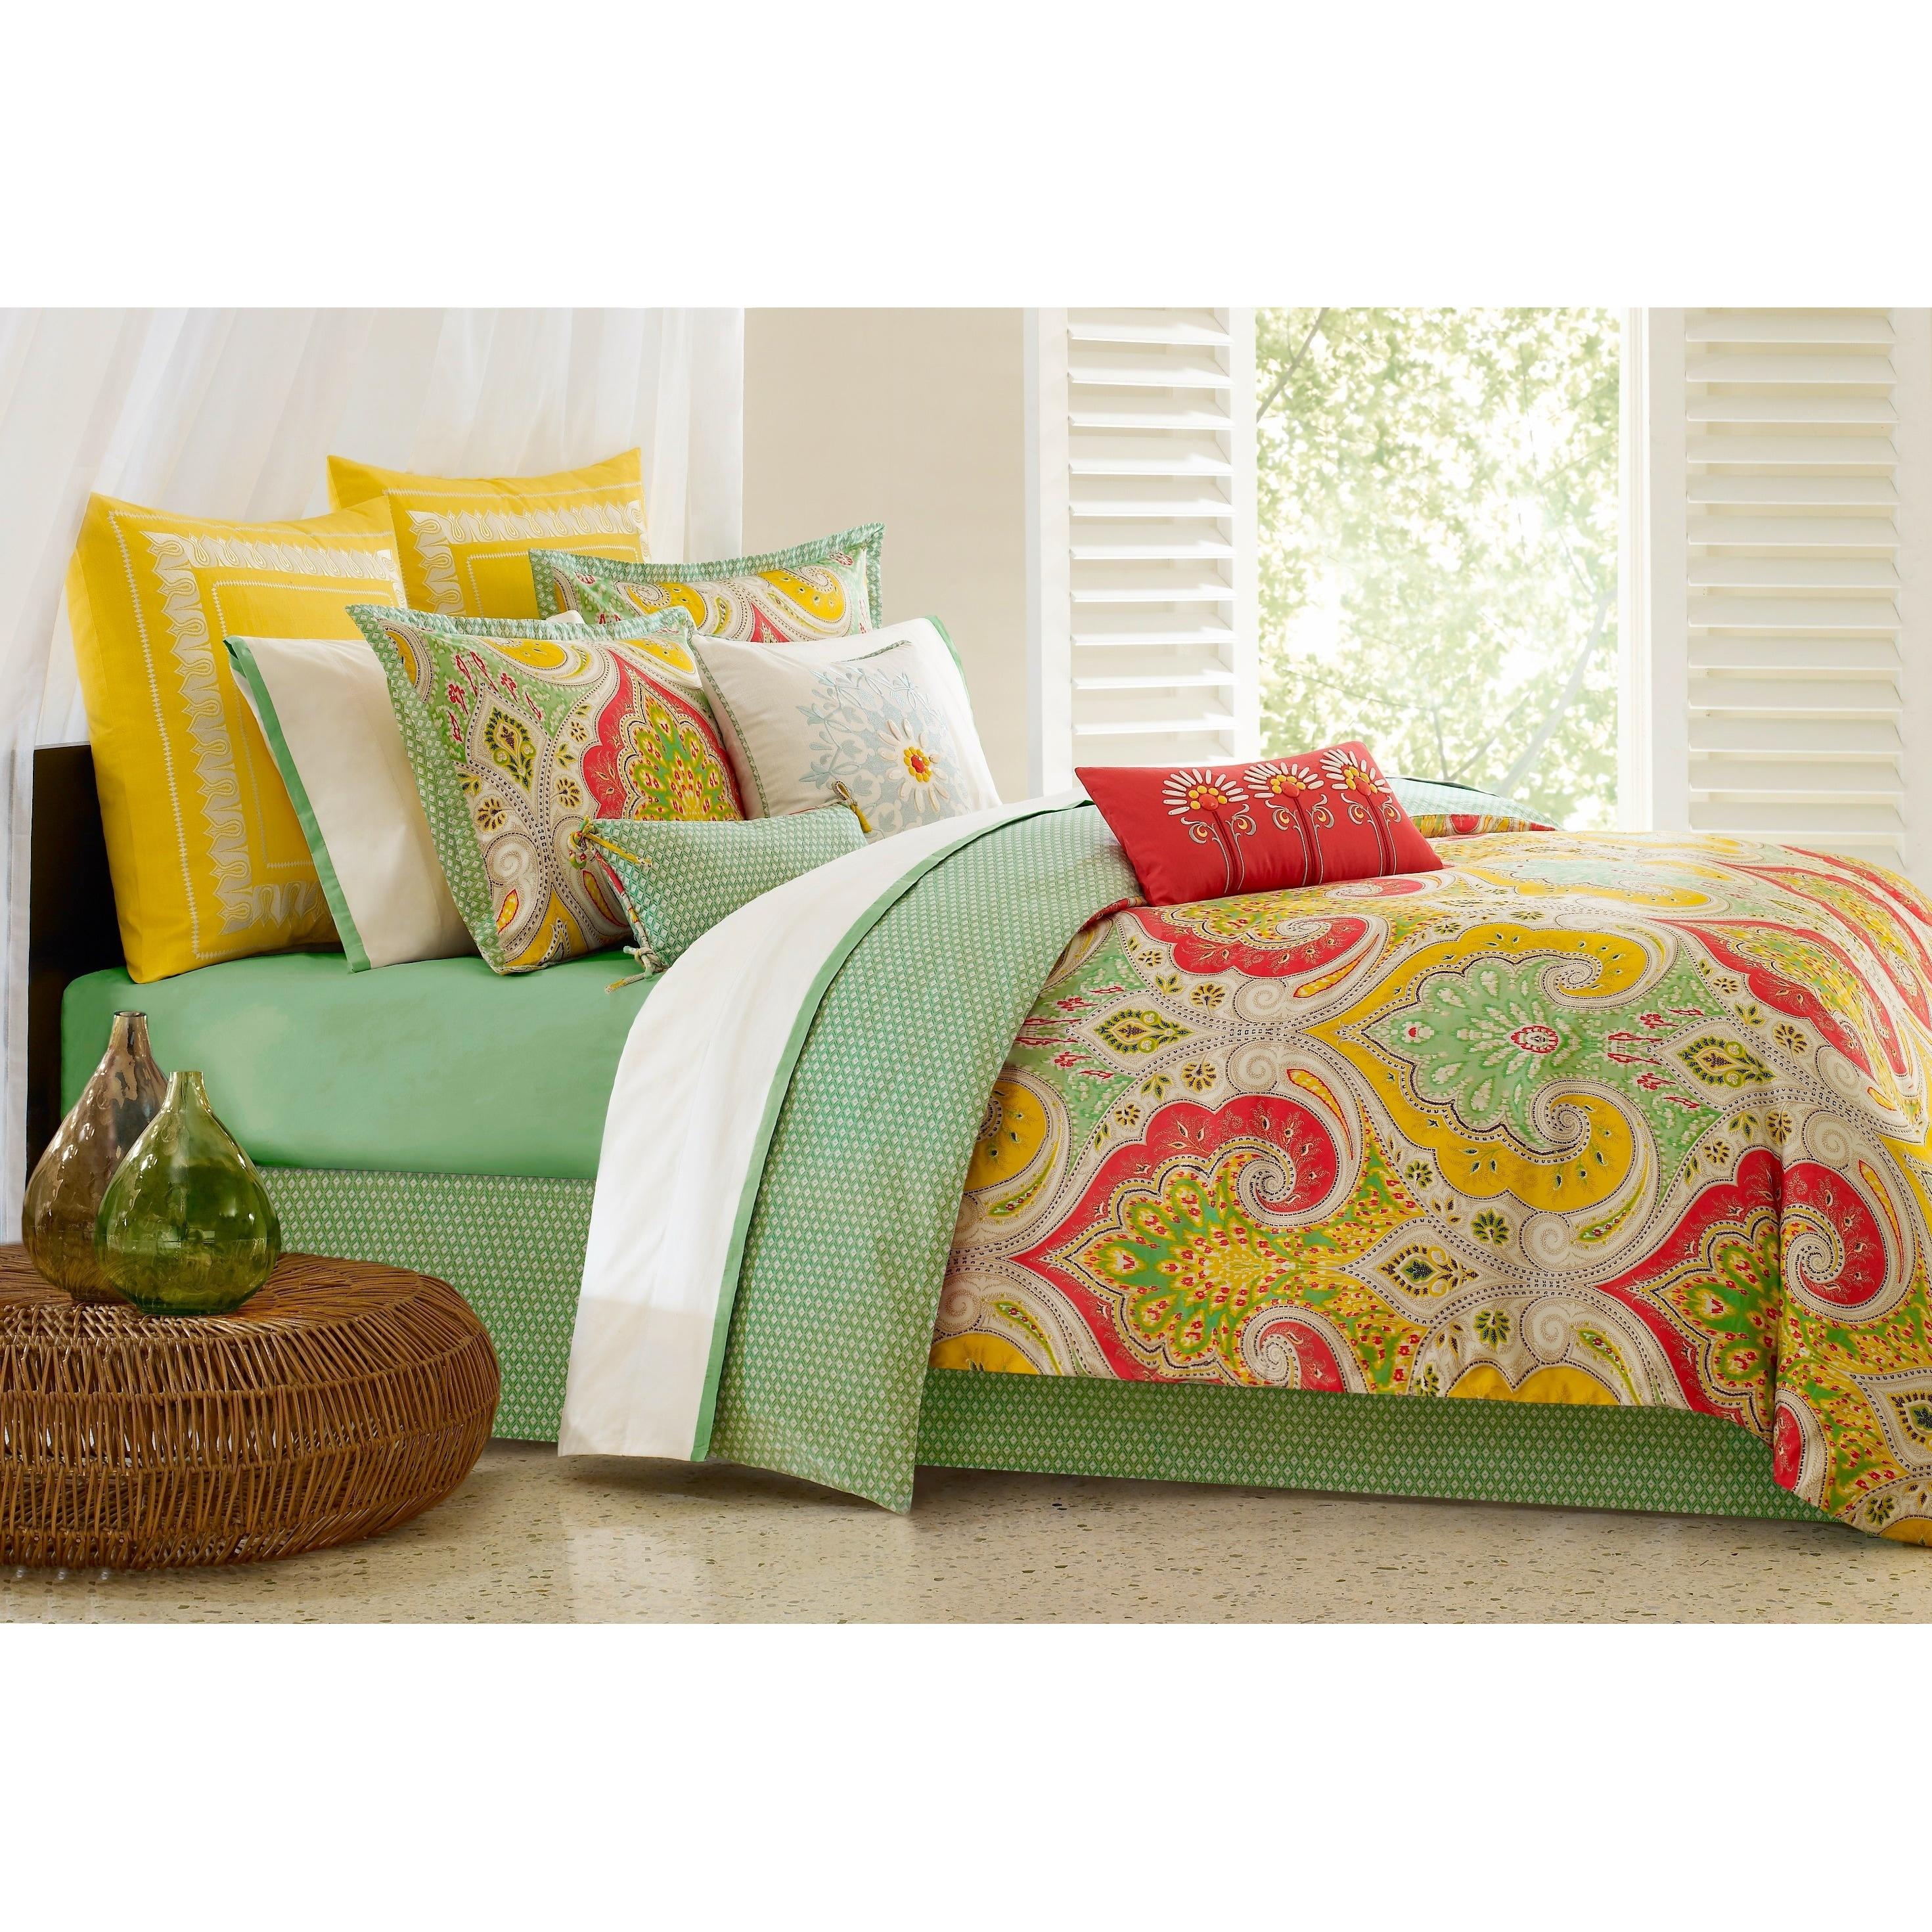 Shop Echo Design Jaipur Yellow Cotton 26 X 26 Inch Euro Sham With